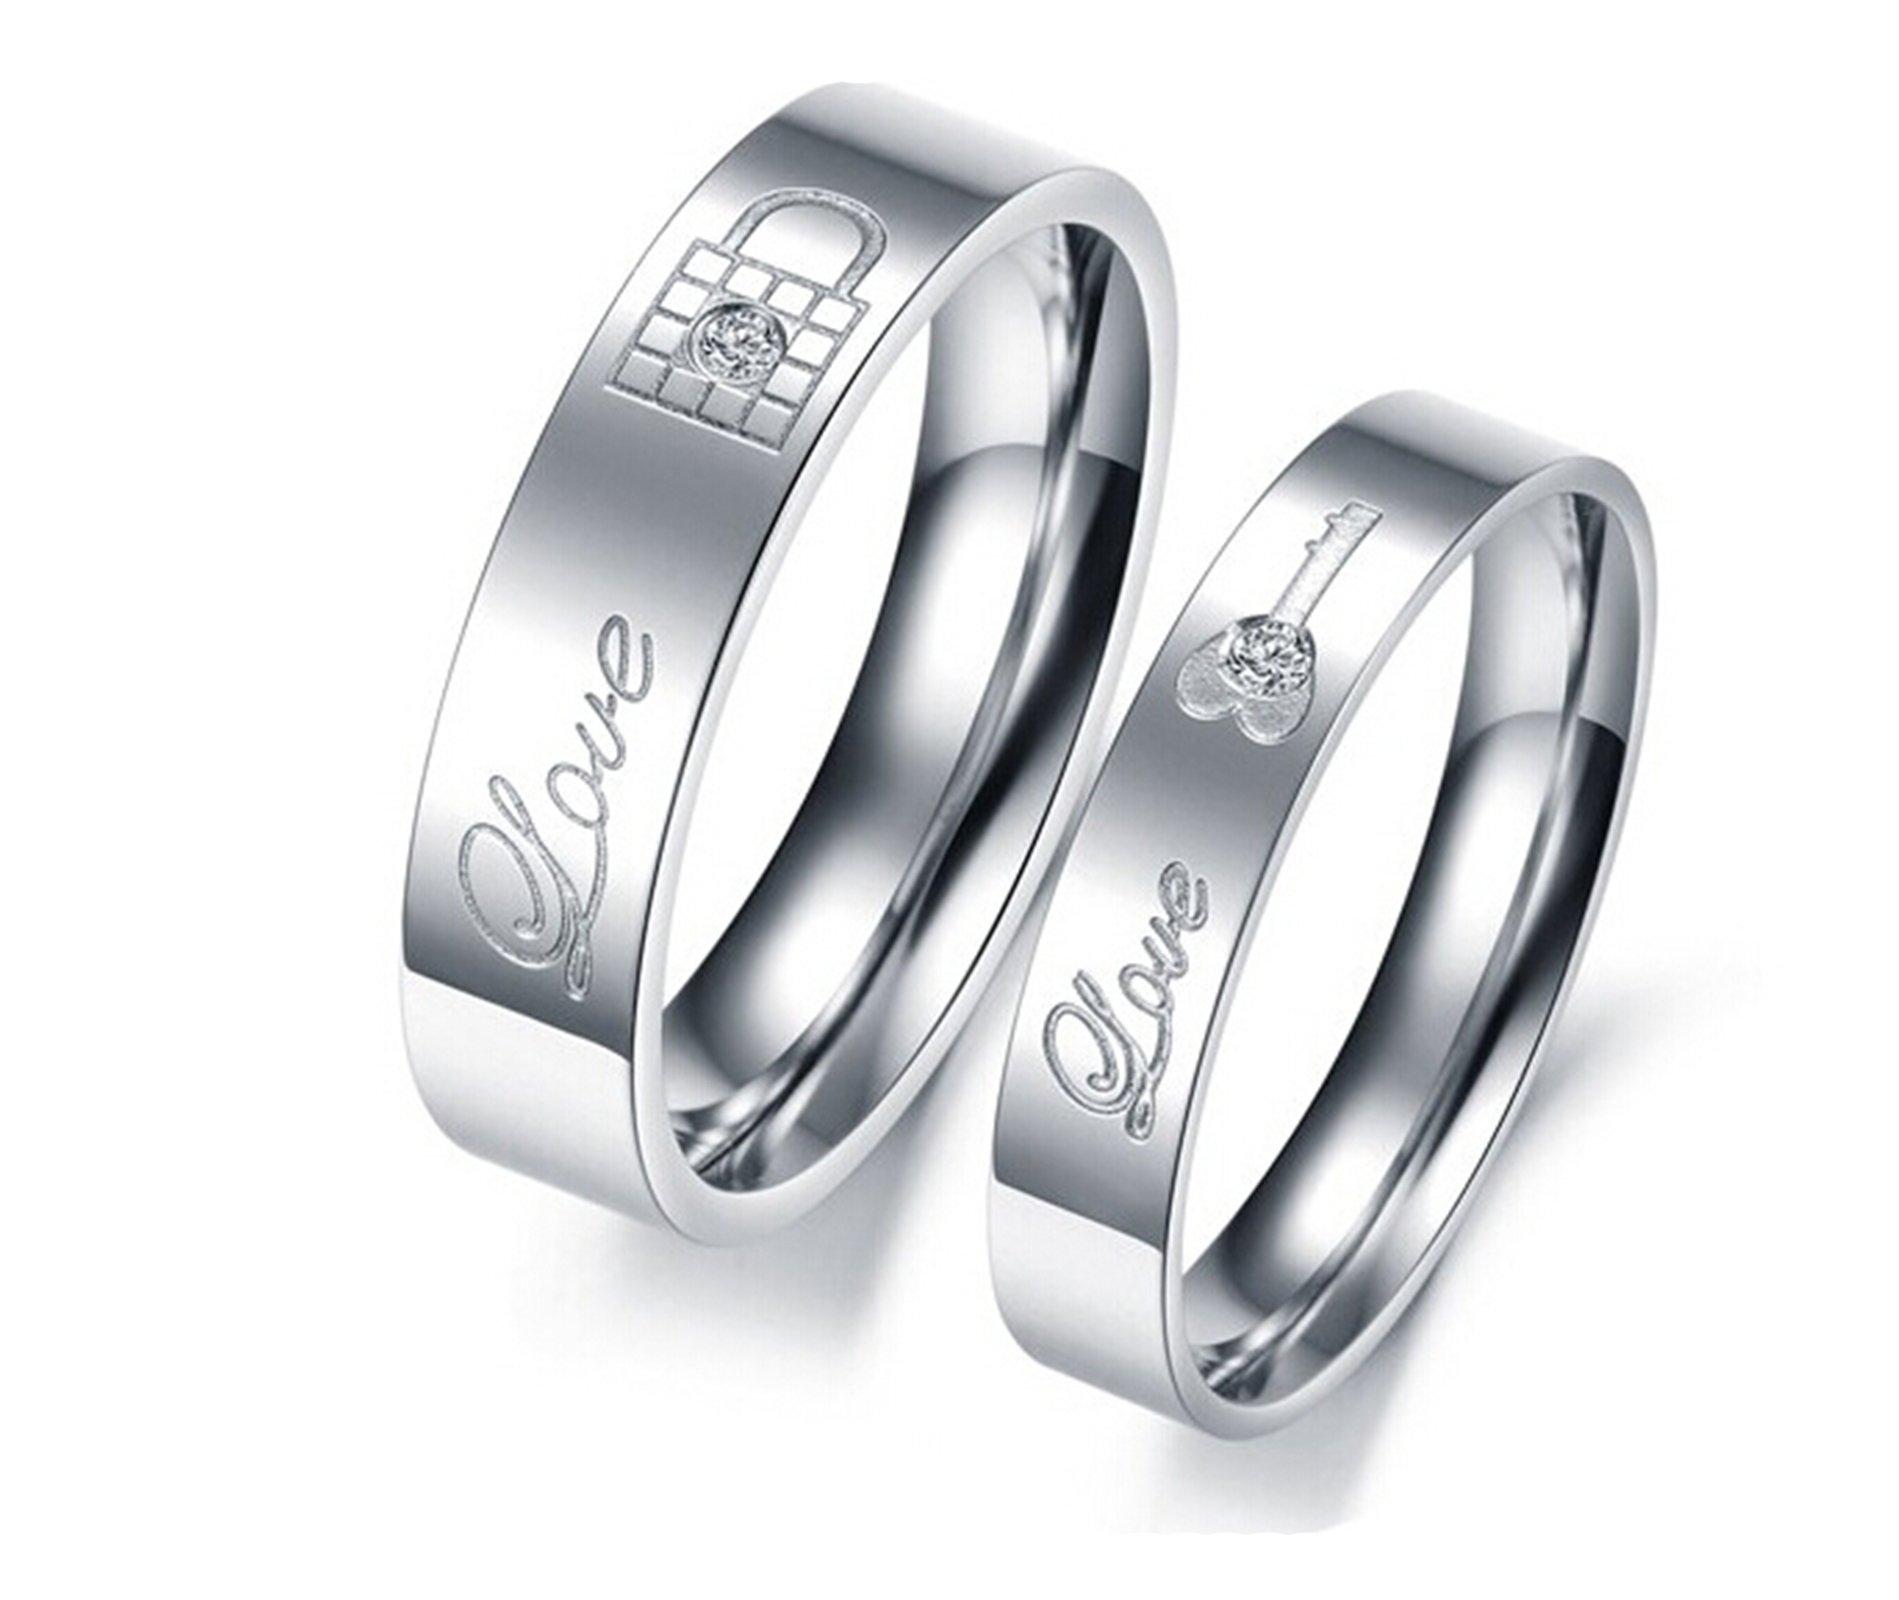 Daesar 1PCS Ring Stainless Steel Wedding Ring Engraving Love Cubic Zirconia White Lock Key Rings Commitment Couple Rings Silver Ring Size 9